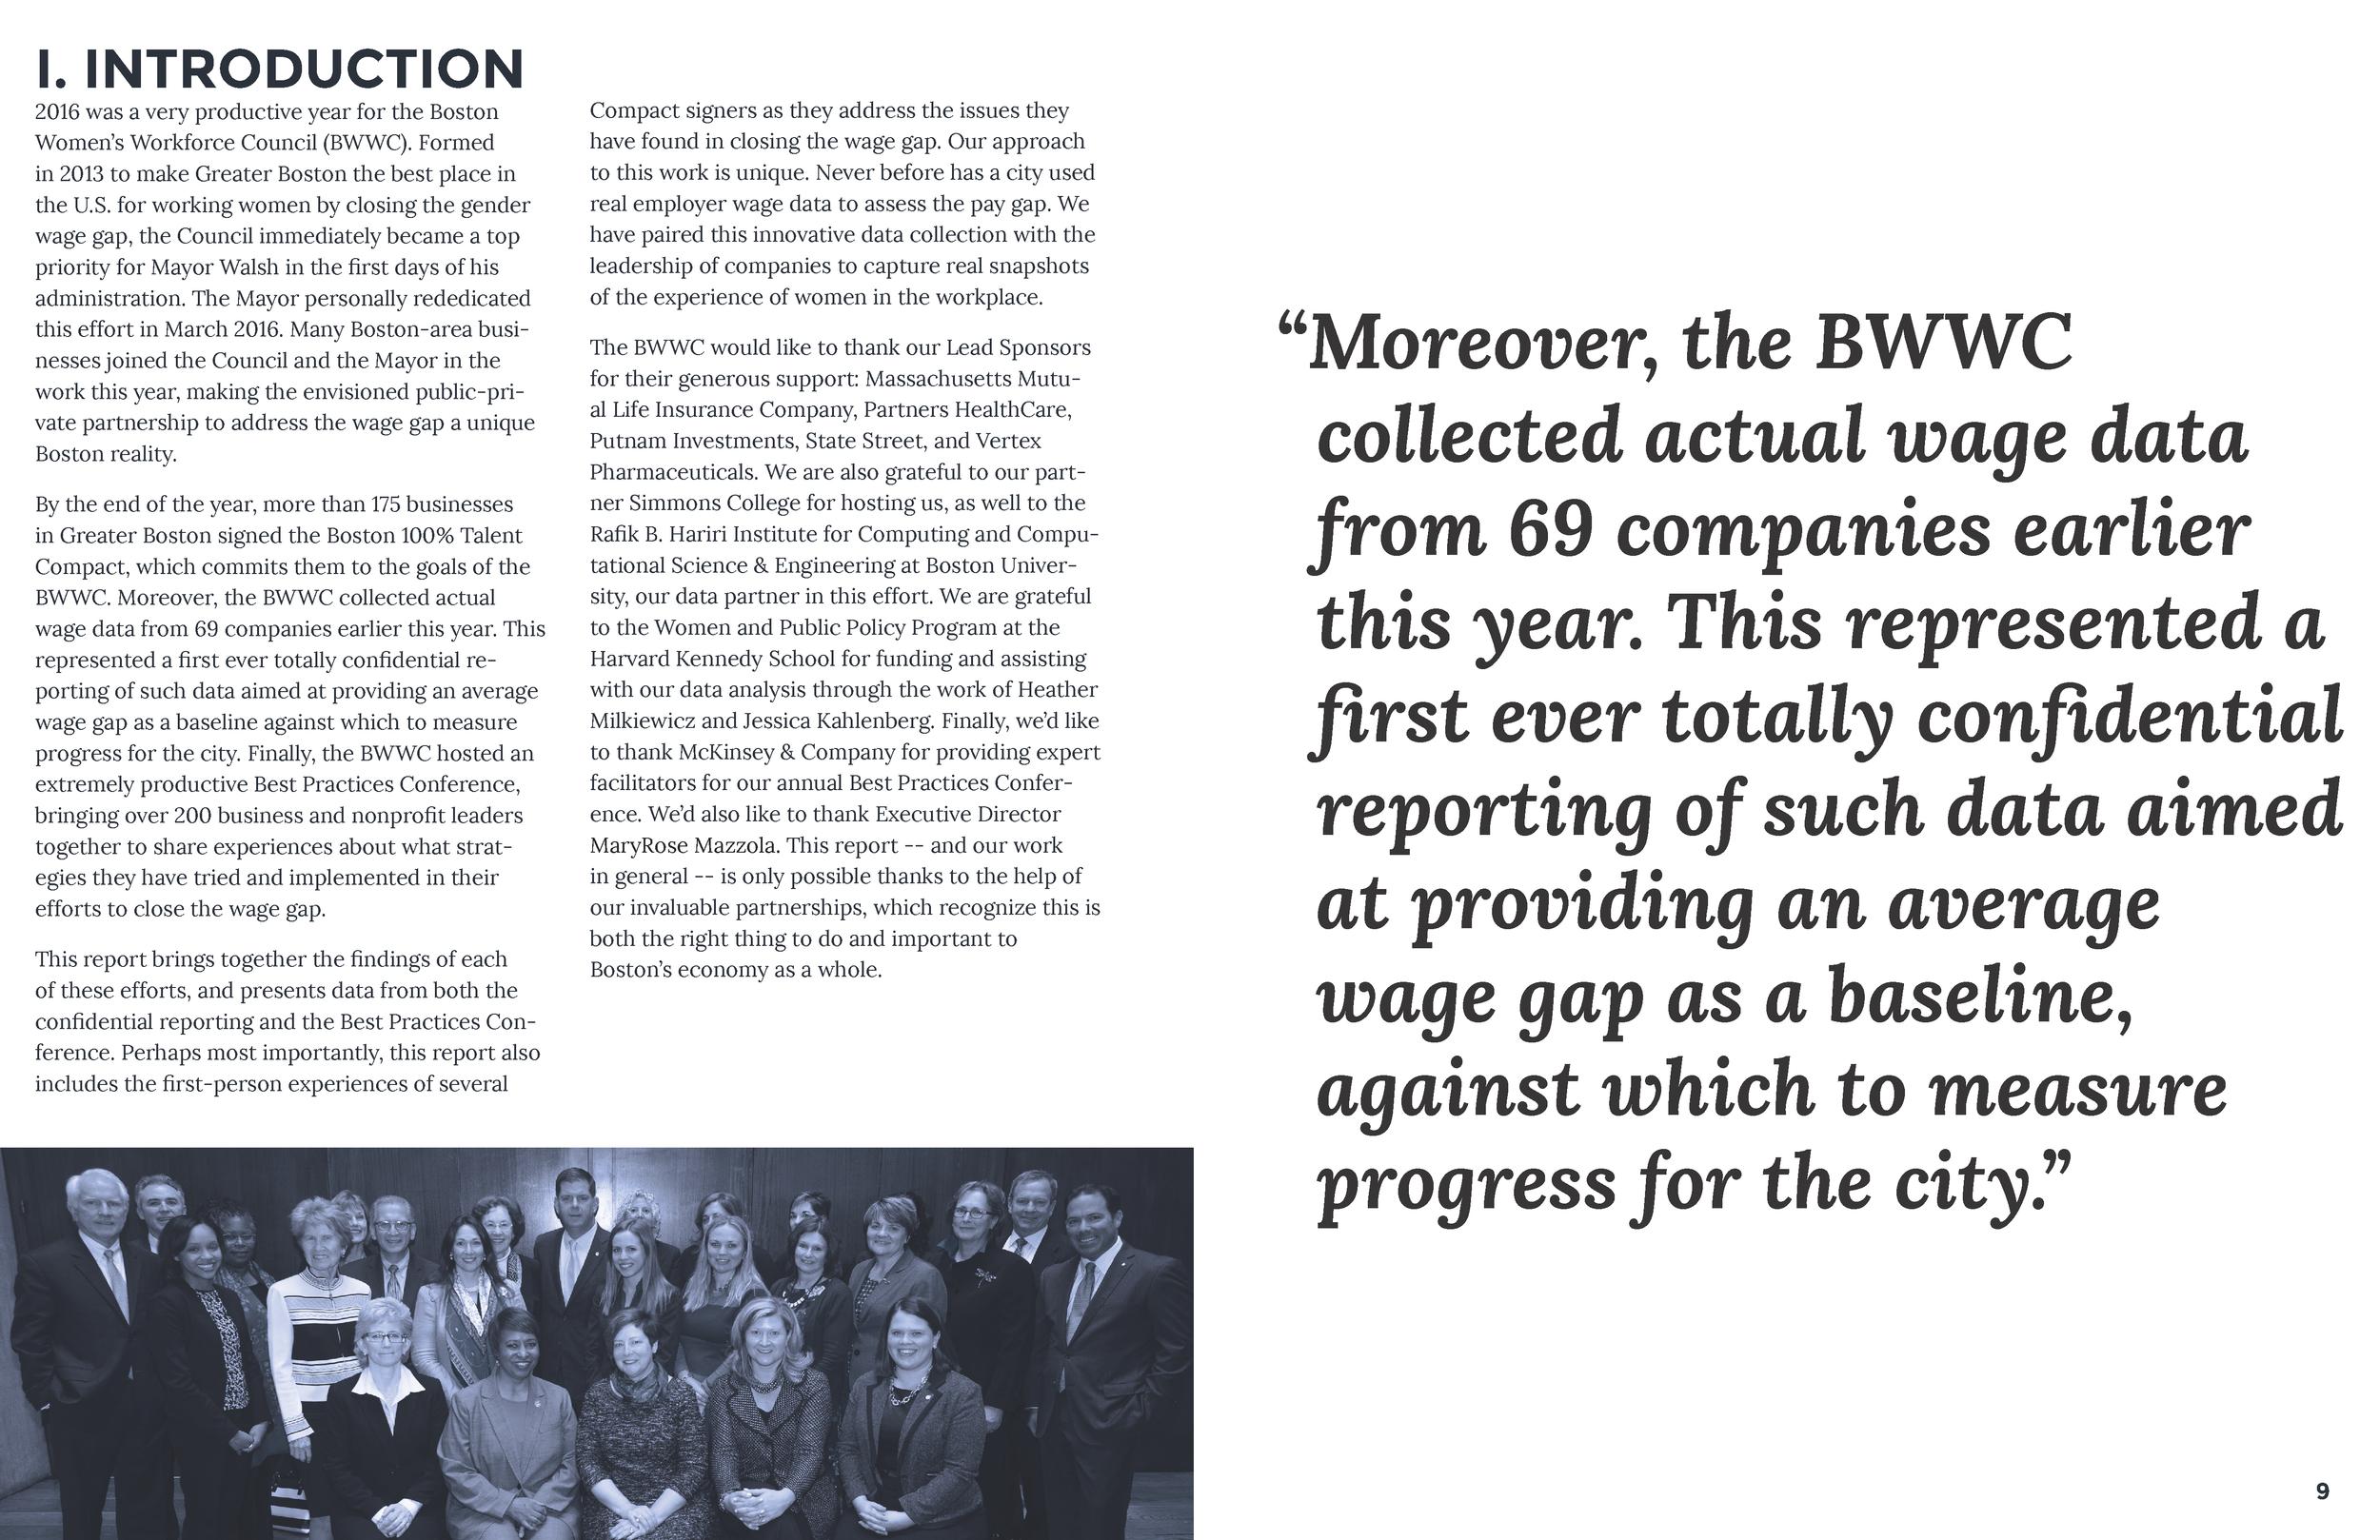 BostonWomen'sWorkforceCouncilReport2016_Page_05.png